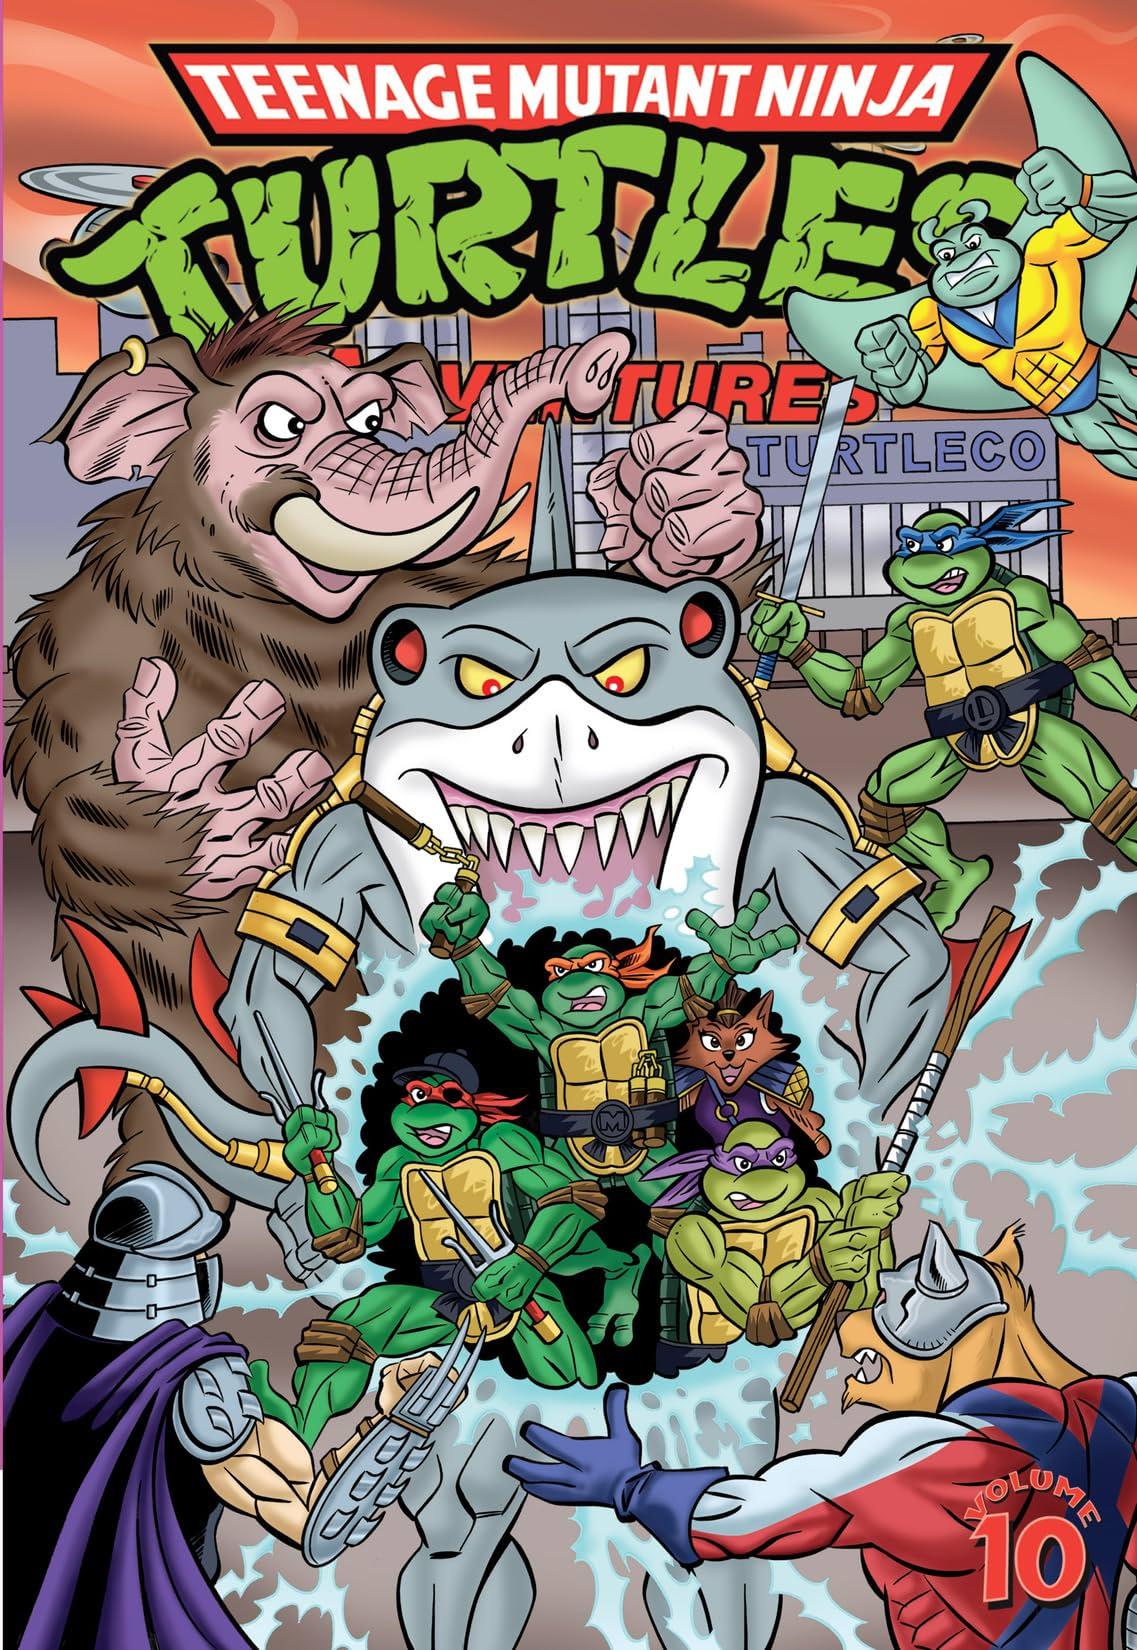 Teenage Mutant Ninja Turtles Adventures Vol  10 - Comics by comiXology